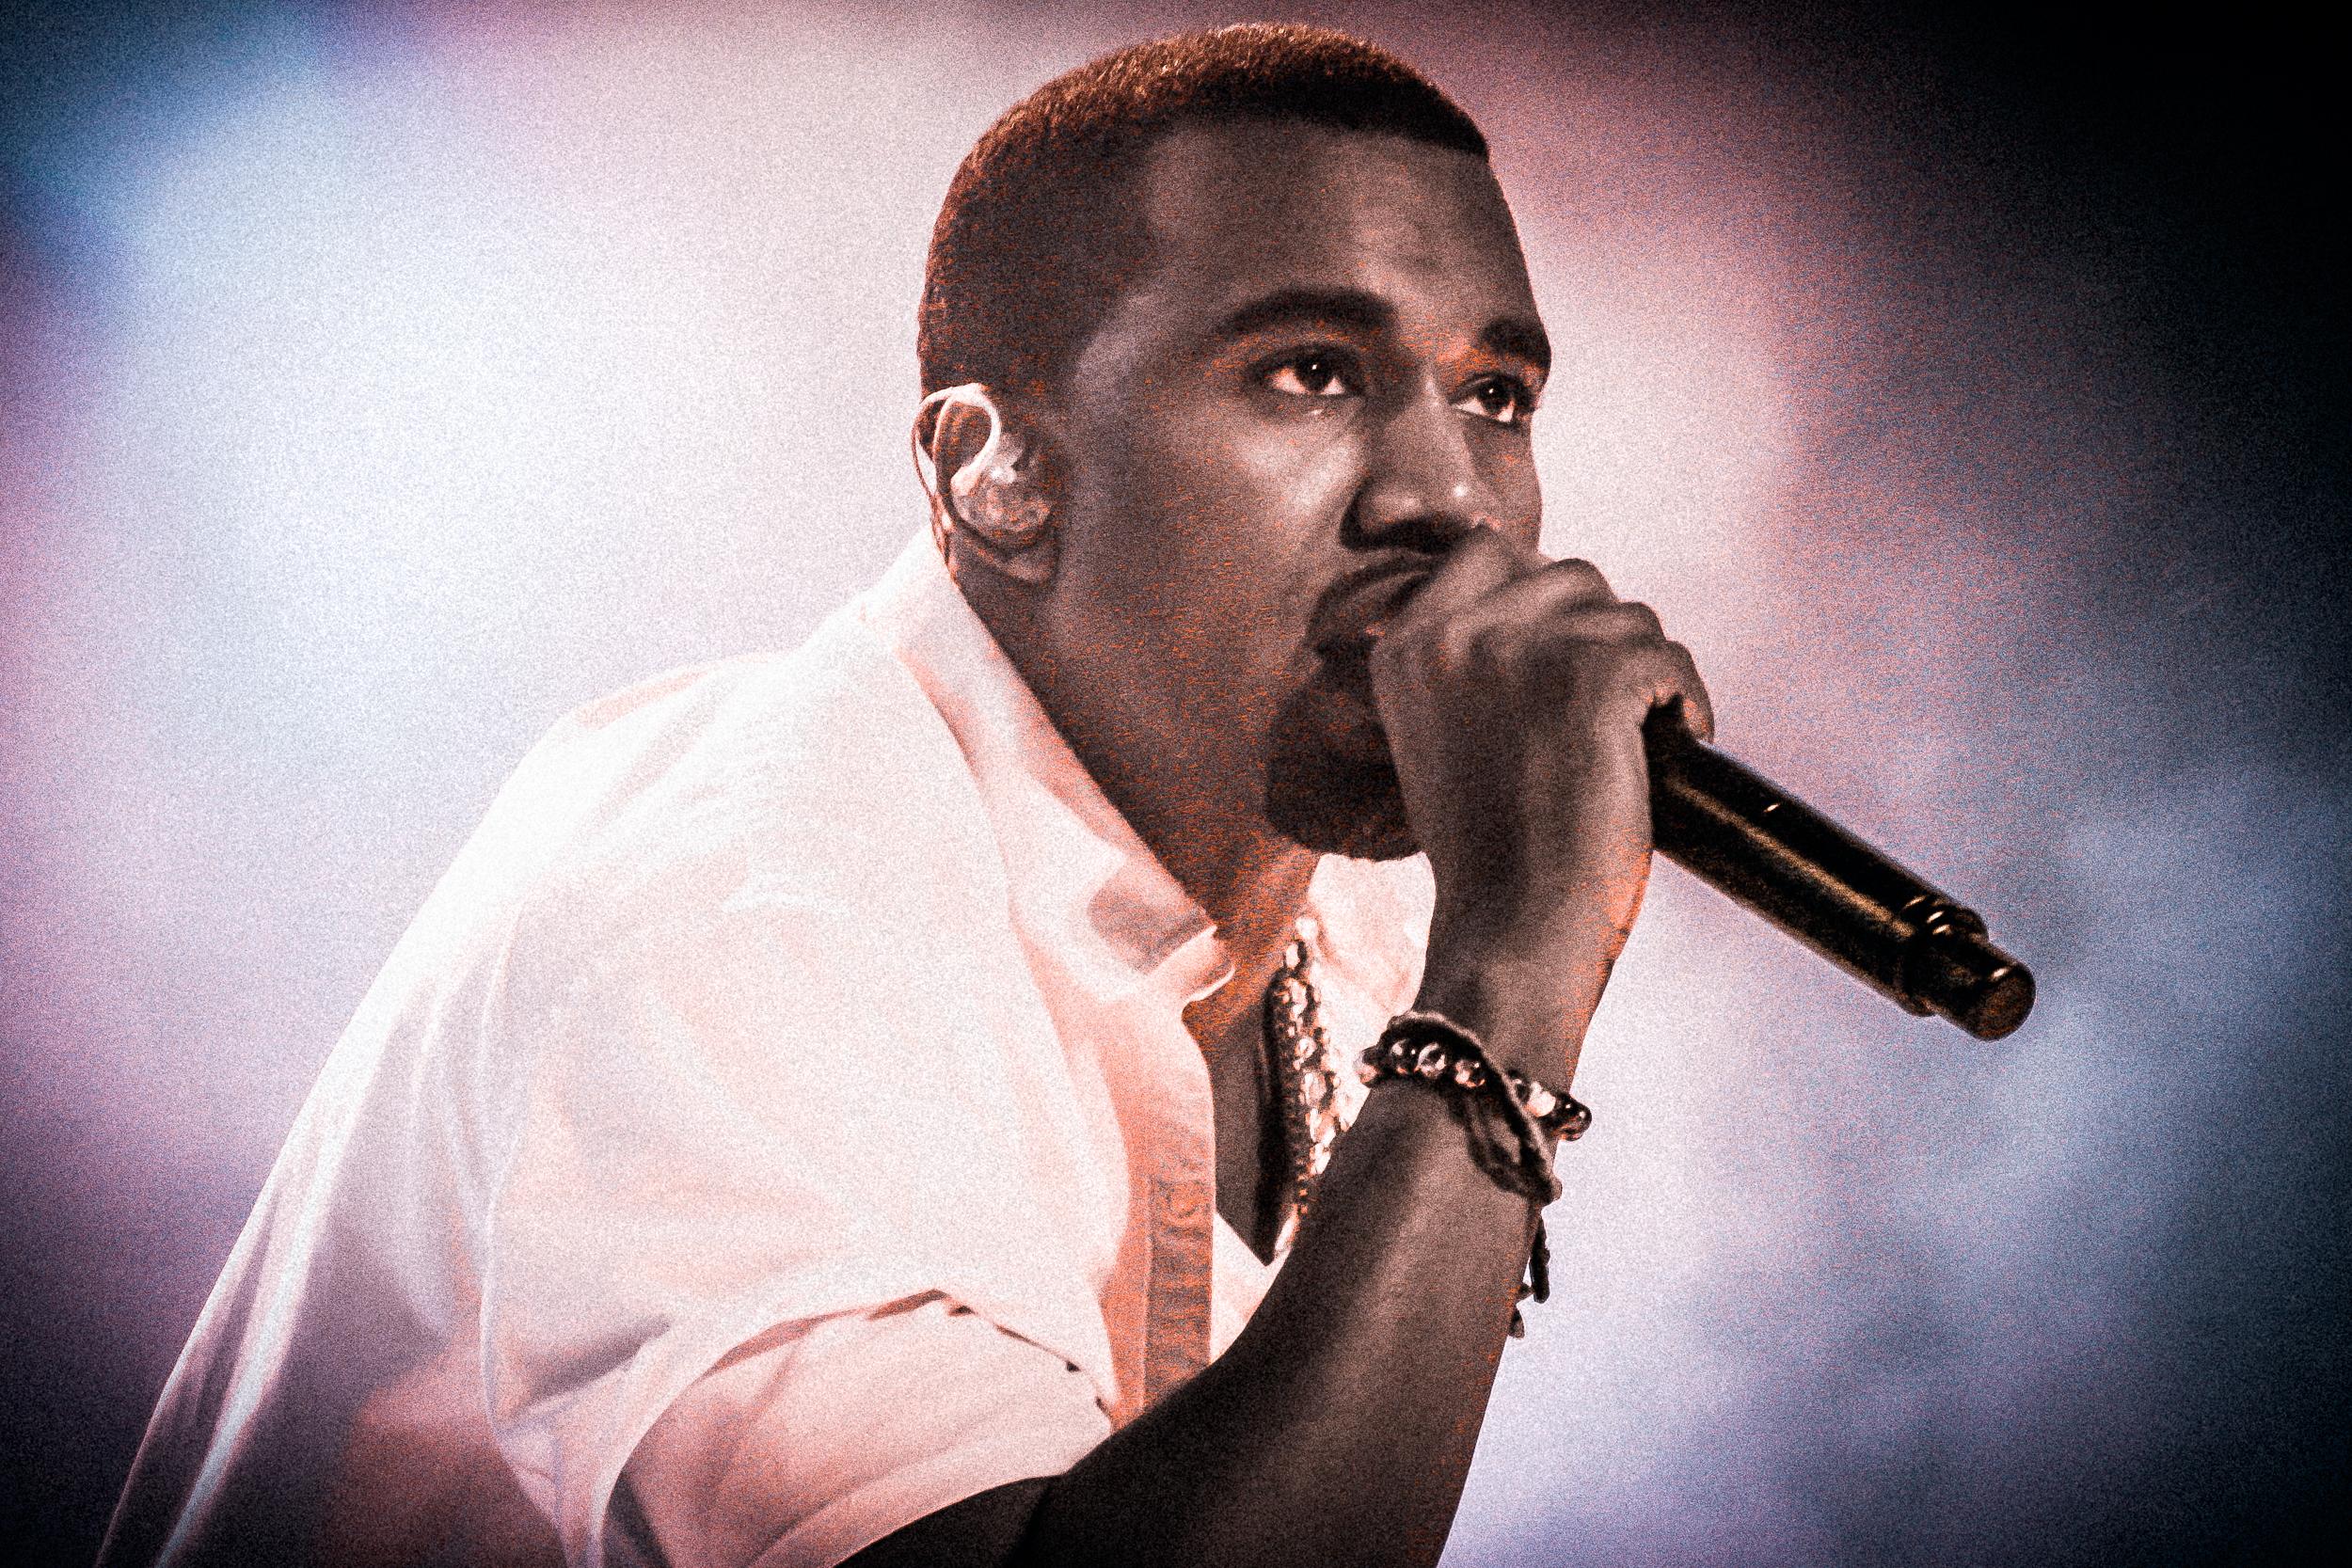 Kanye West at Øyafestivalen 2011, Oslo.